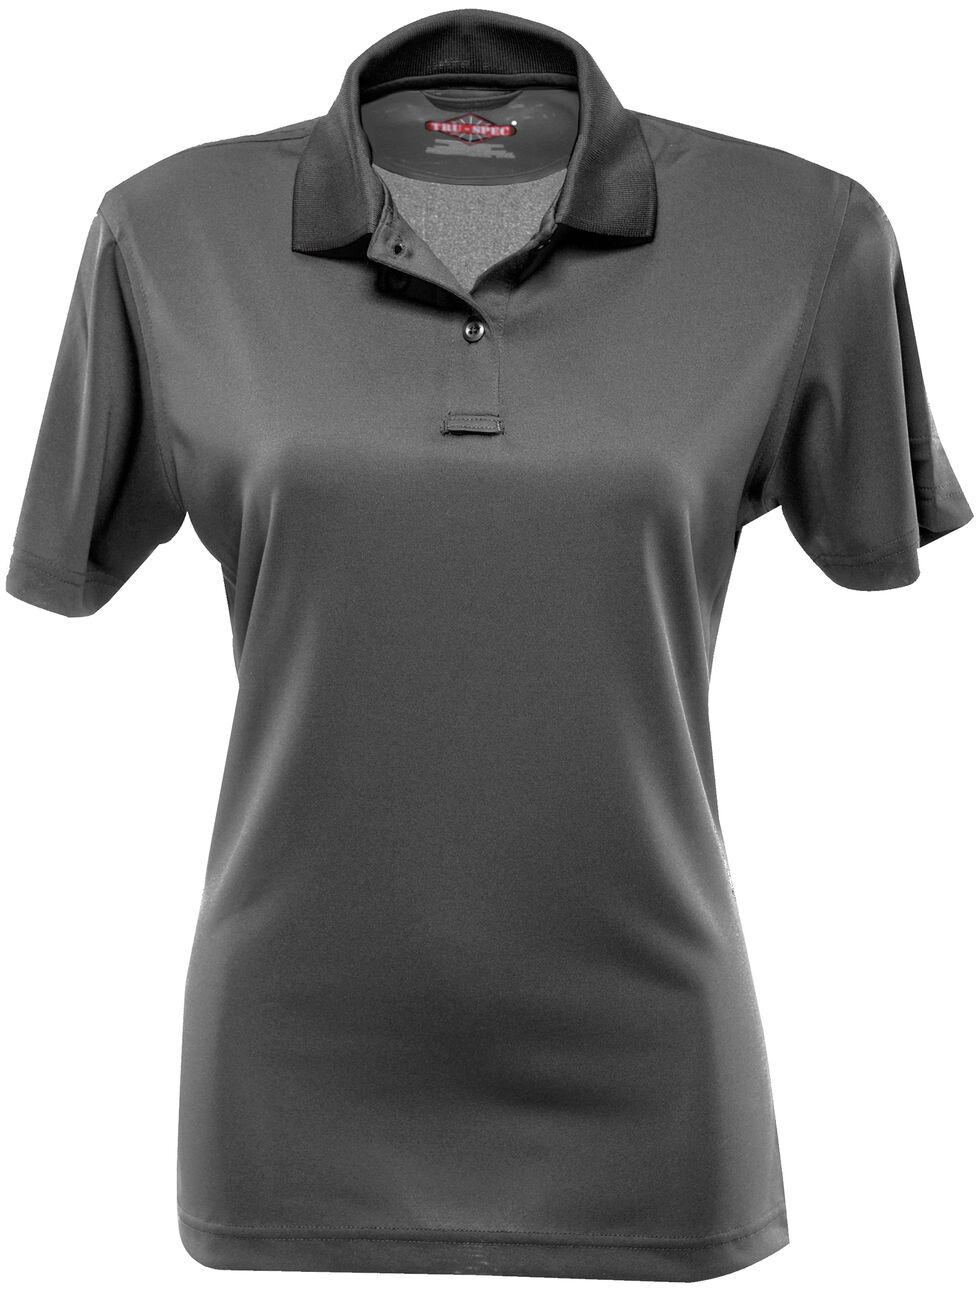 Tru-Spec Women's 24-7 Series Performance Polo Shirt, Charcoal Grey, hi-res